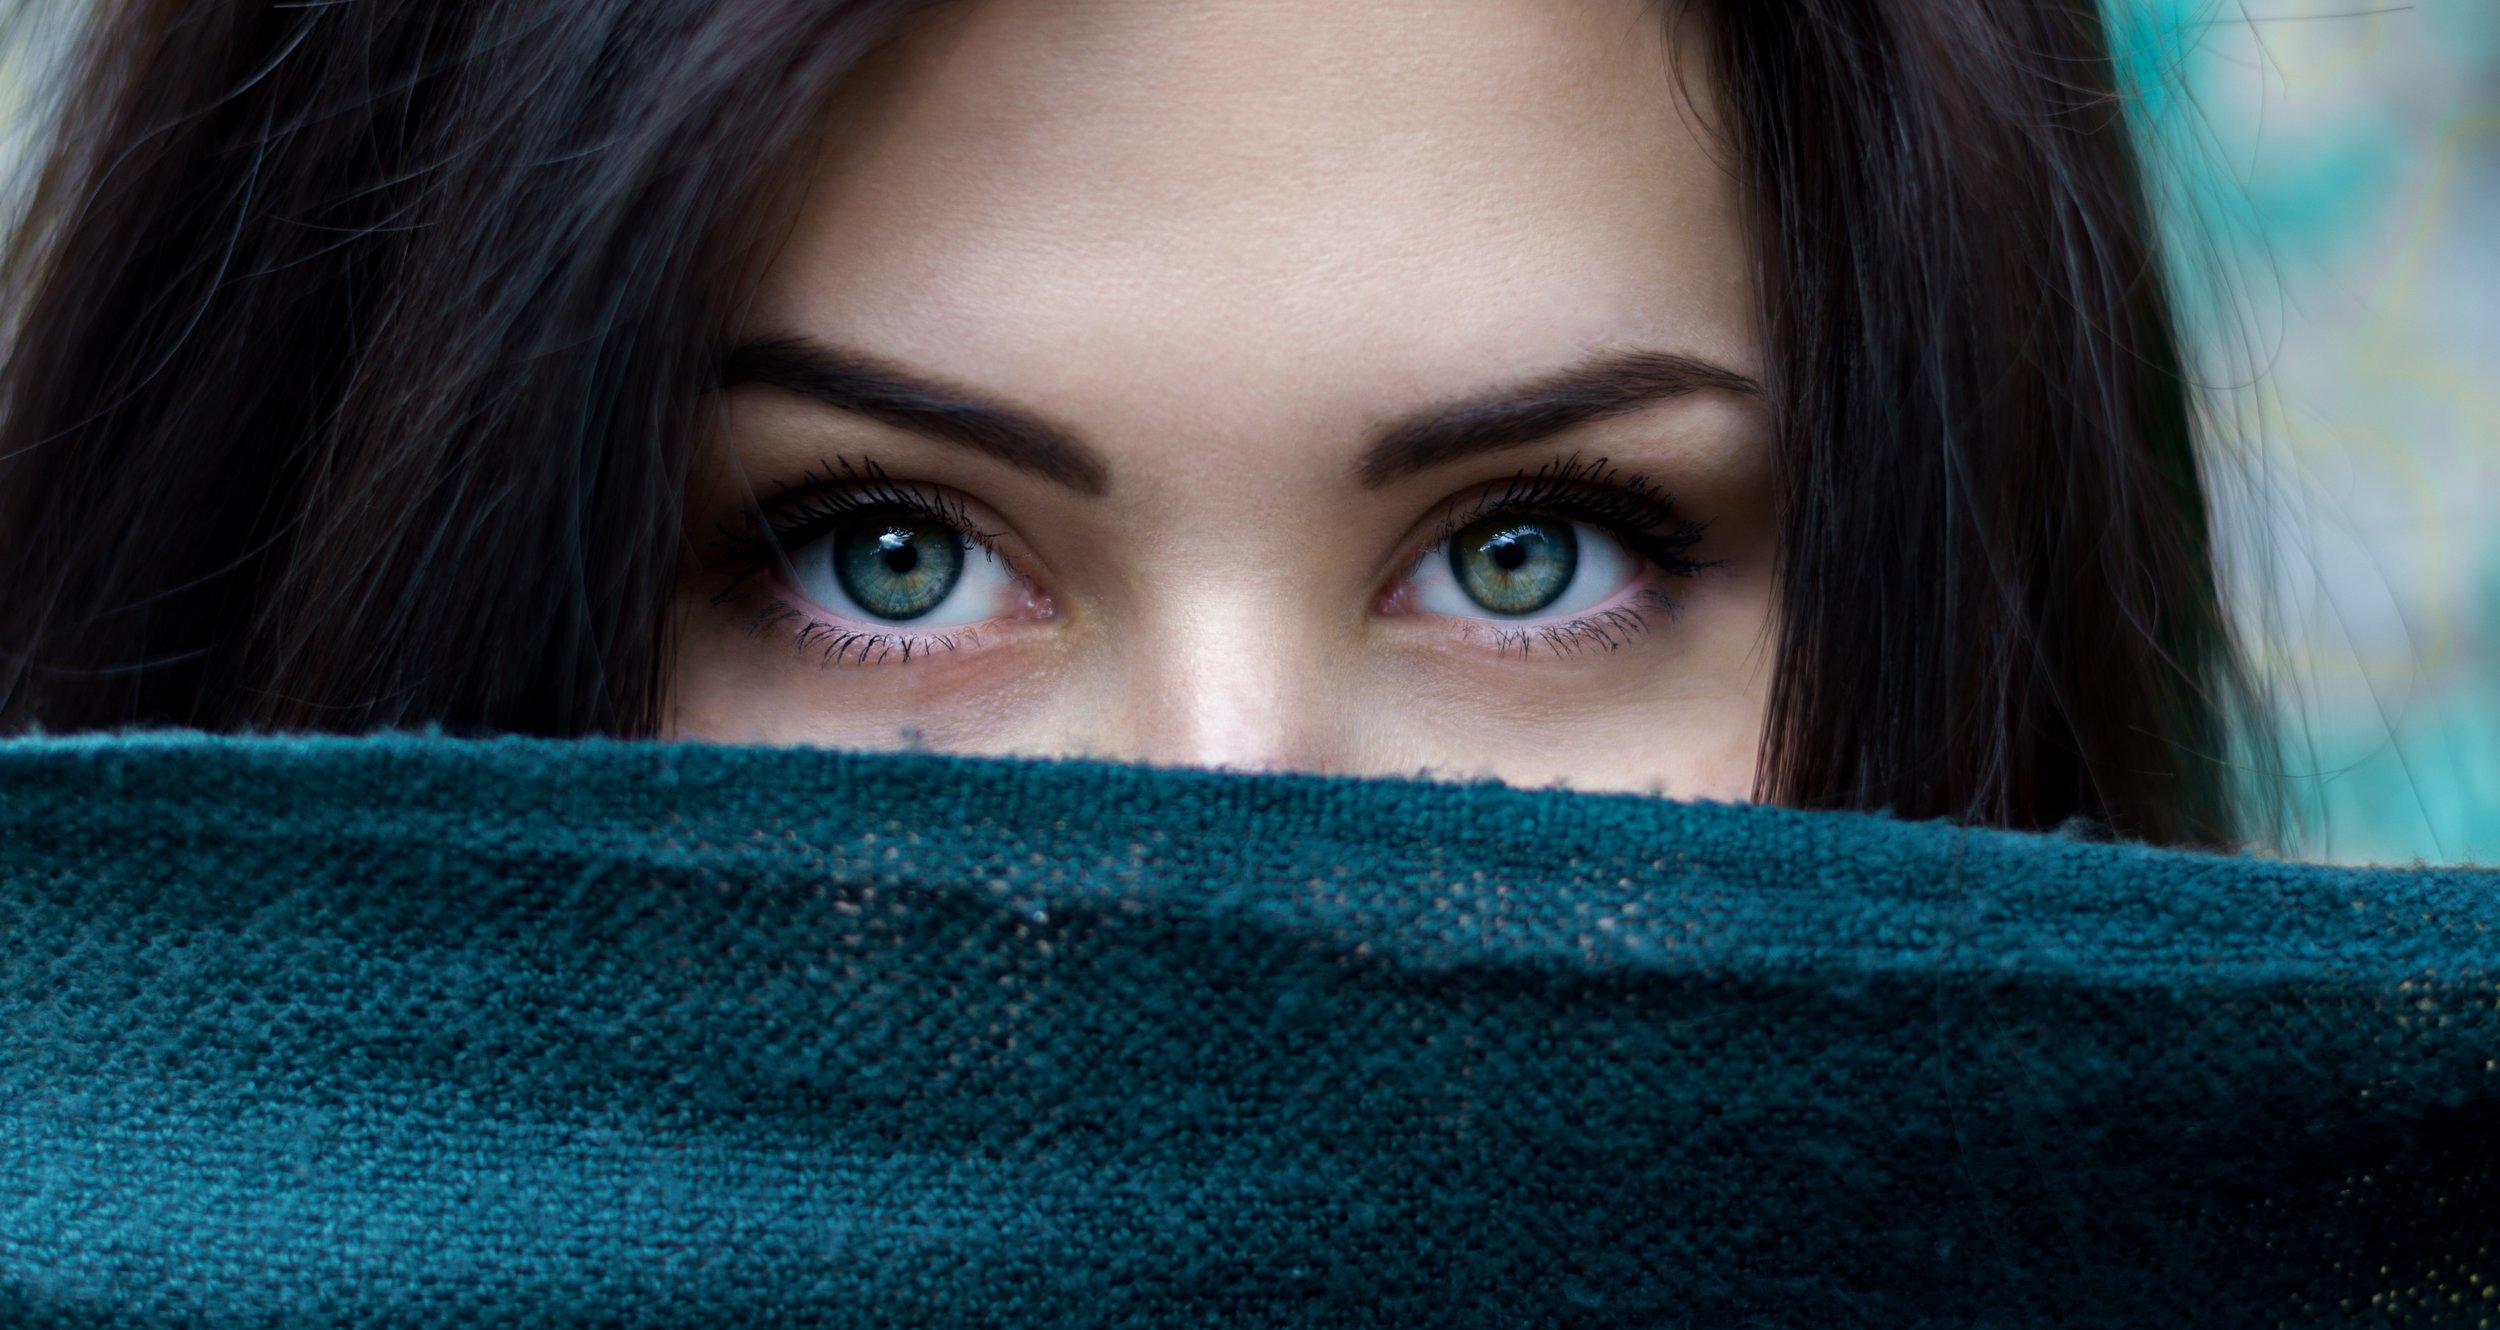 Eyelift (blepharoplasty) -